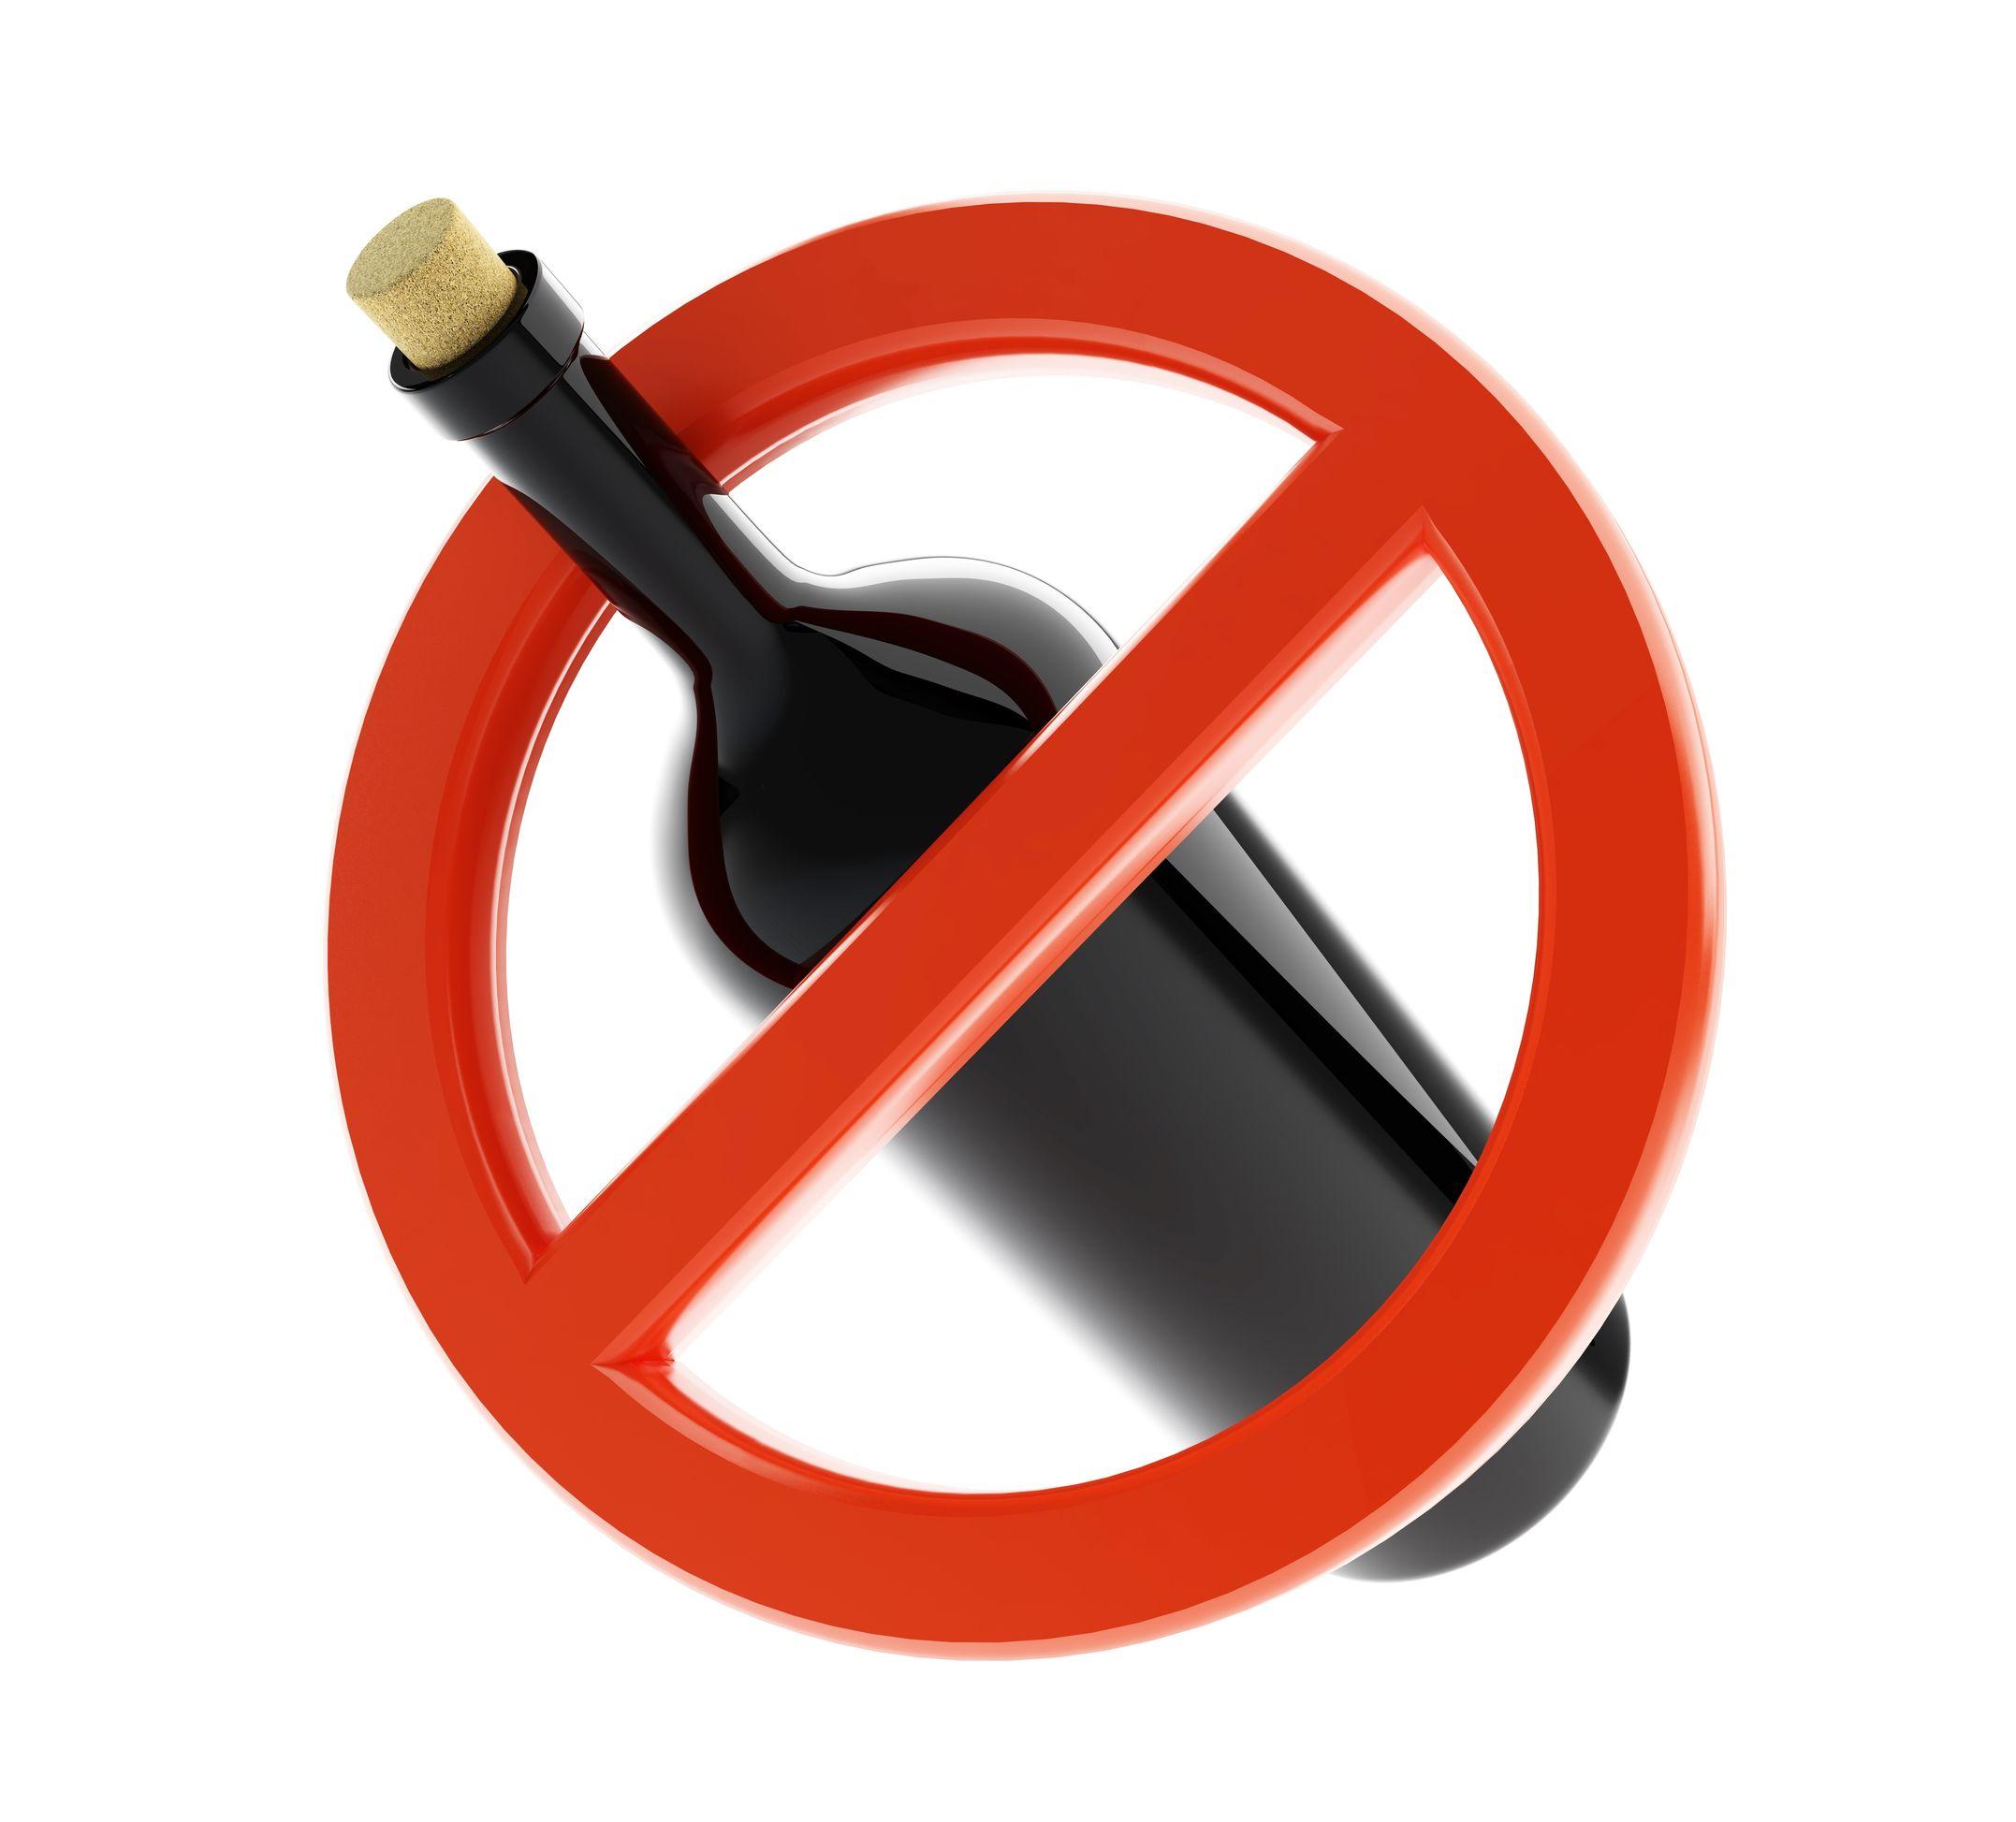 Prohibice